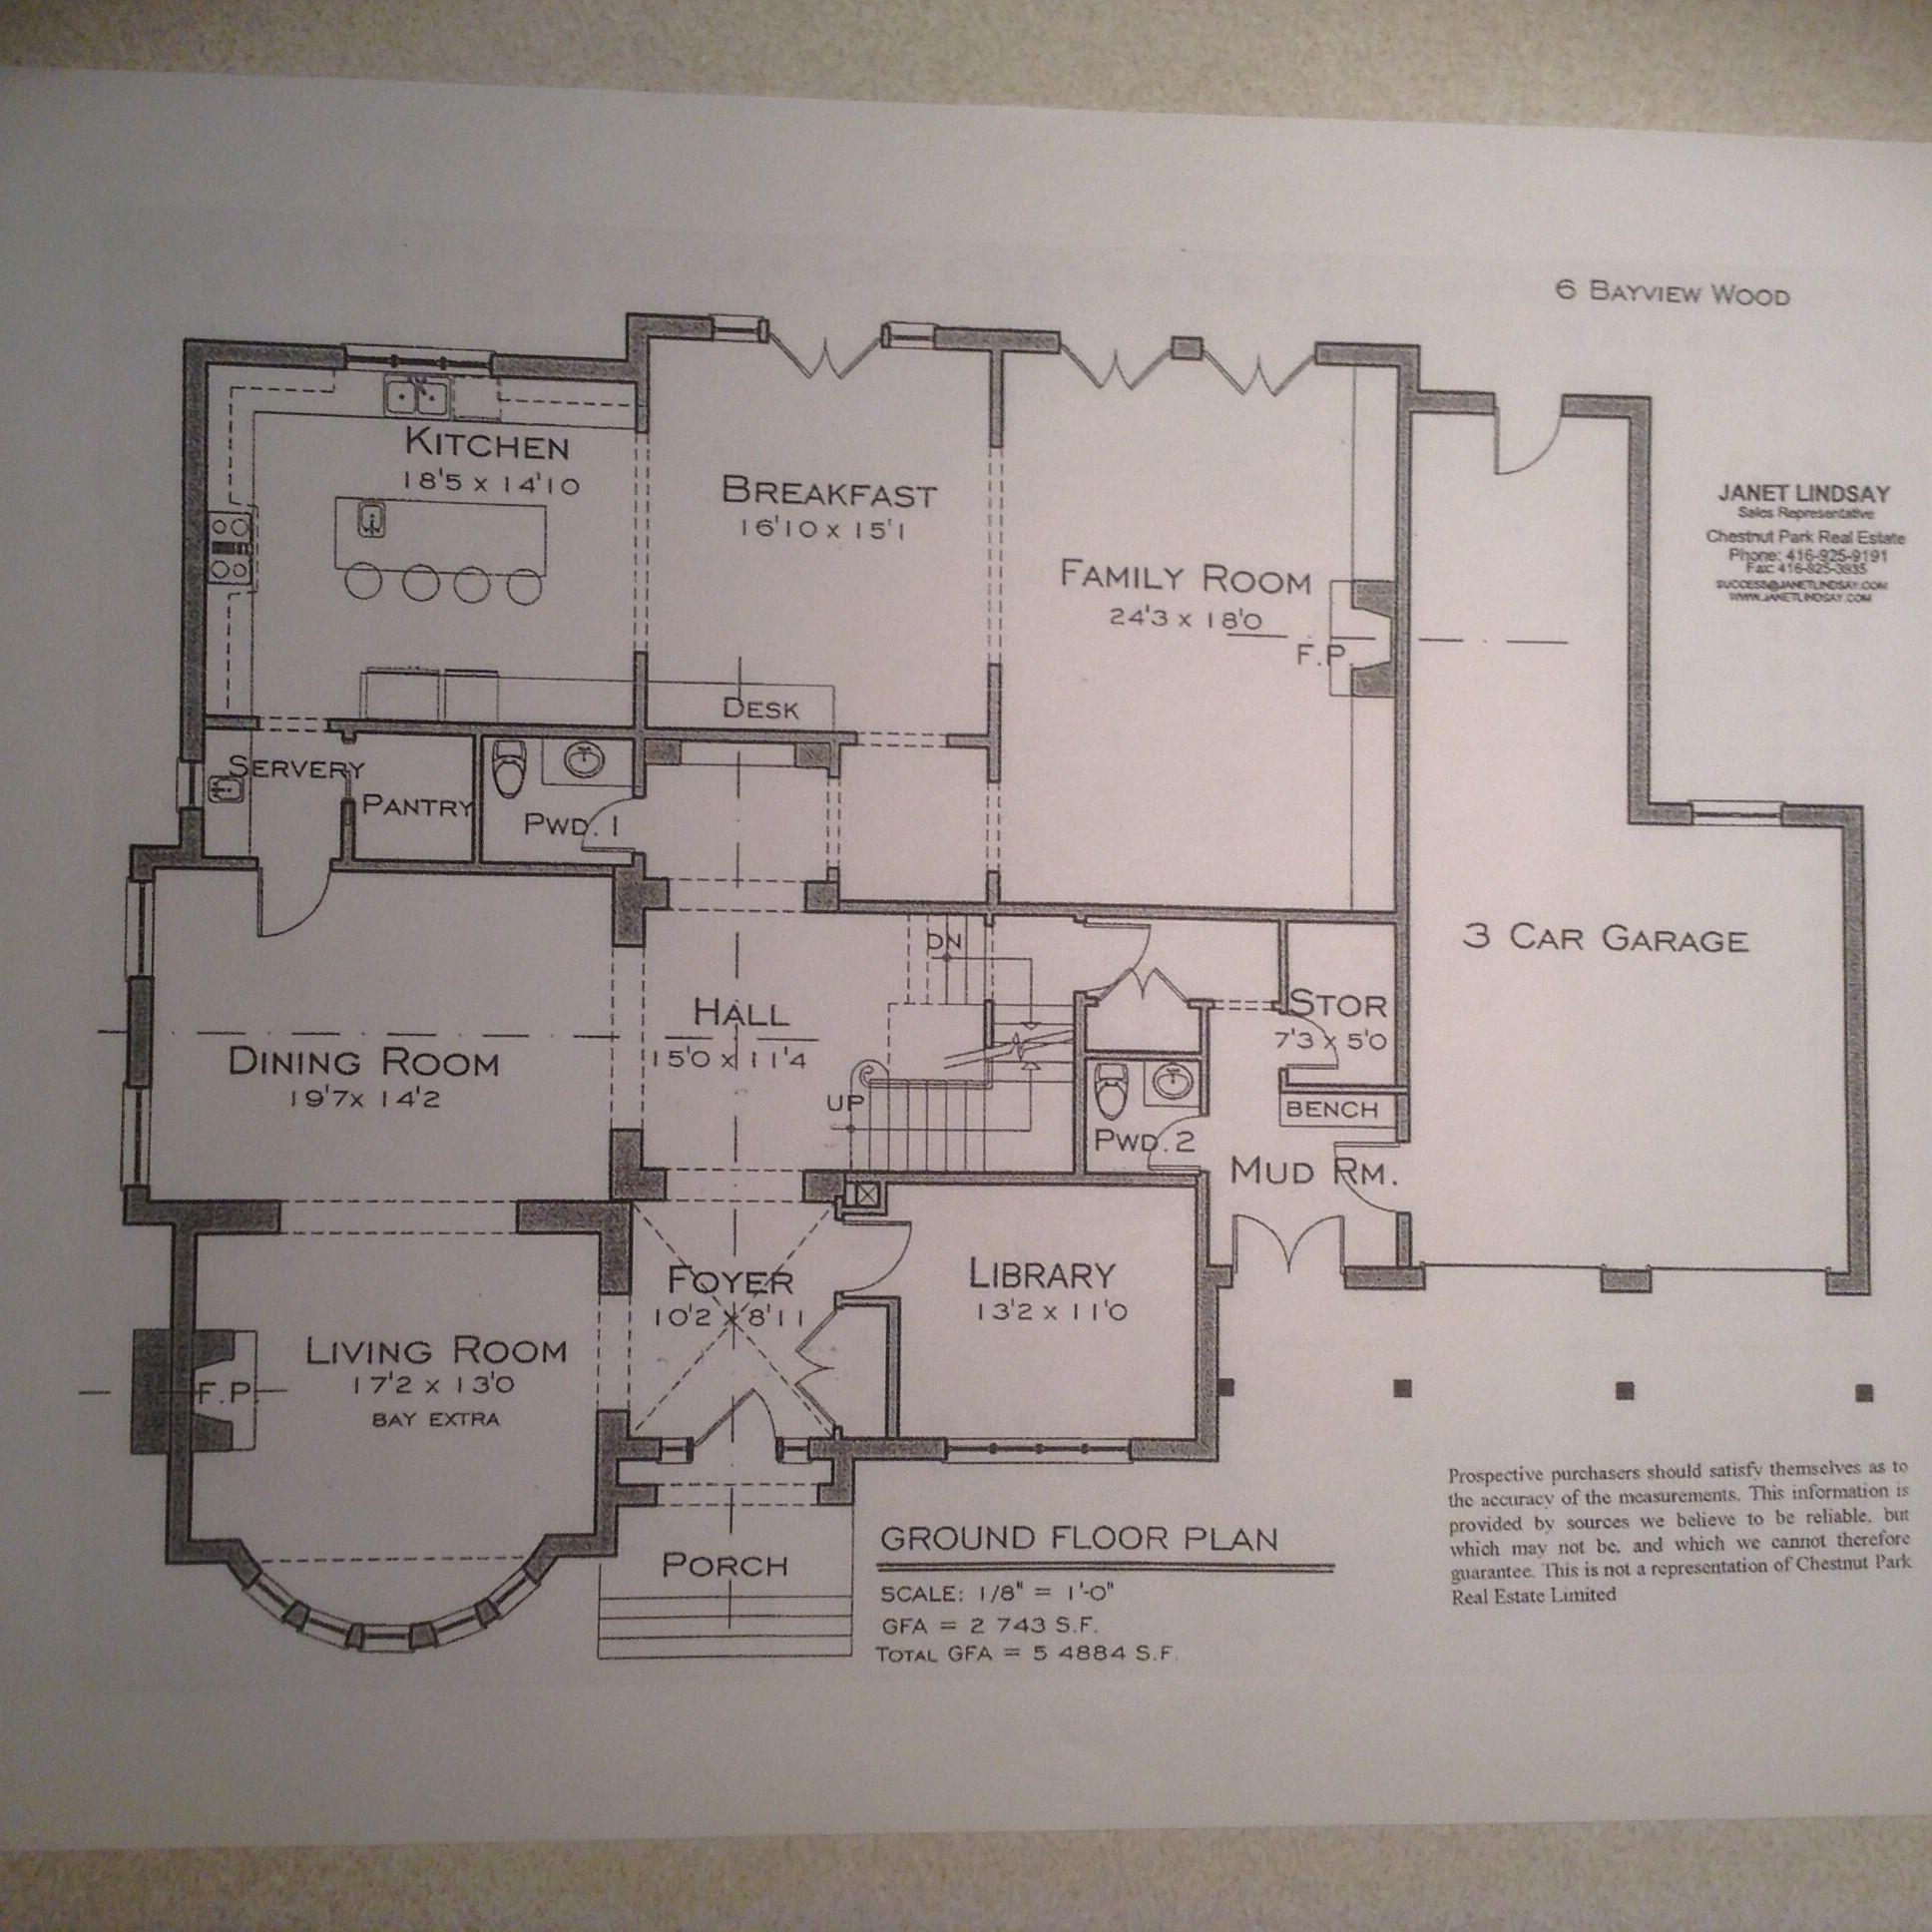 6 Bayview Wood Toronto On Floor Plans Ground Floor Plan Modern House Plans